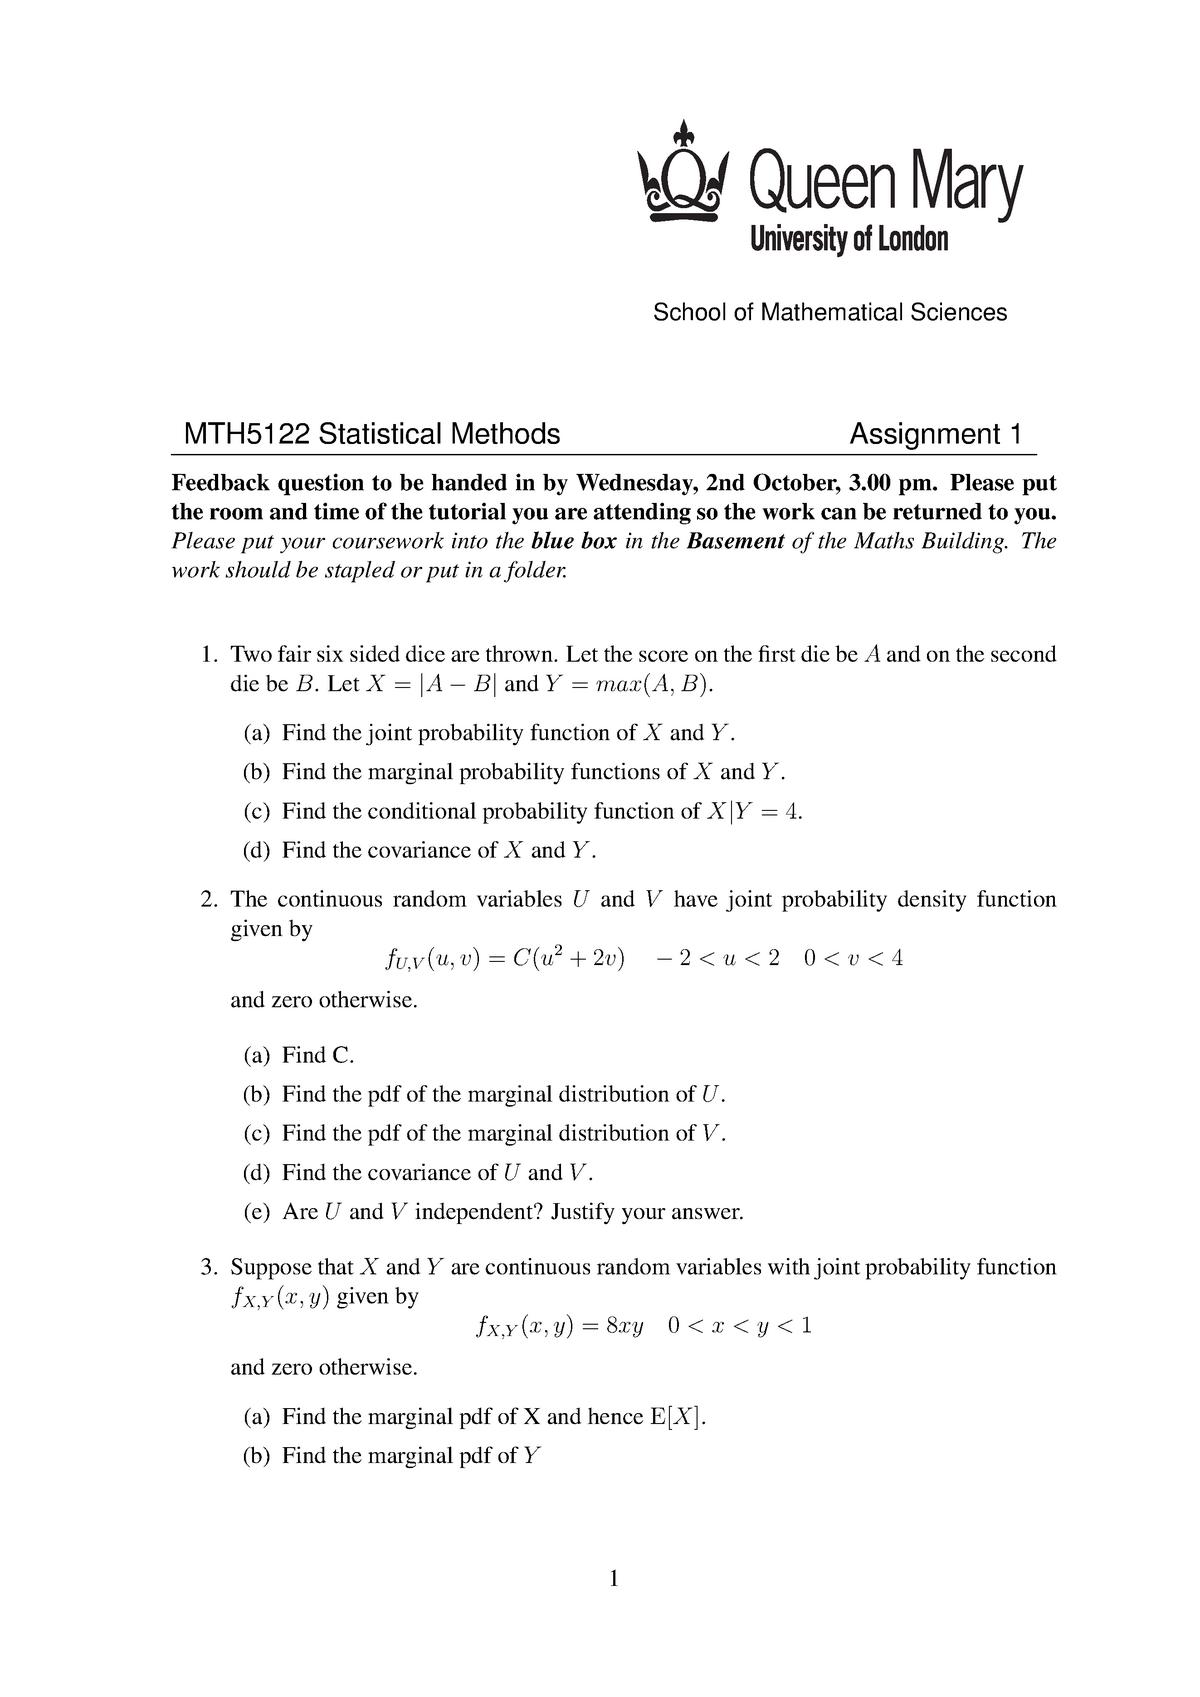 Assignment 1 2013 - MTH5122: Statistical Methods - StuDocu